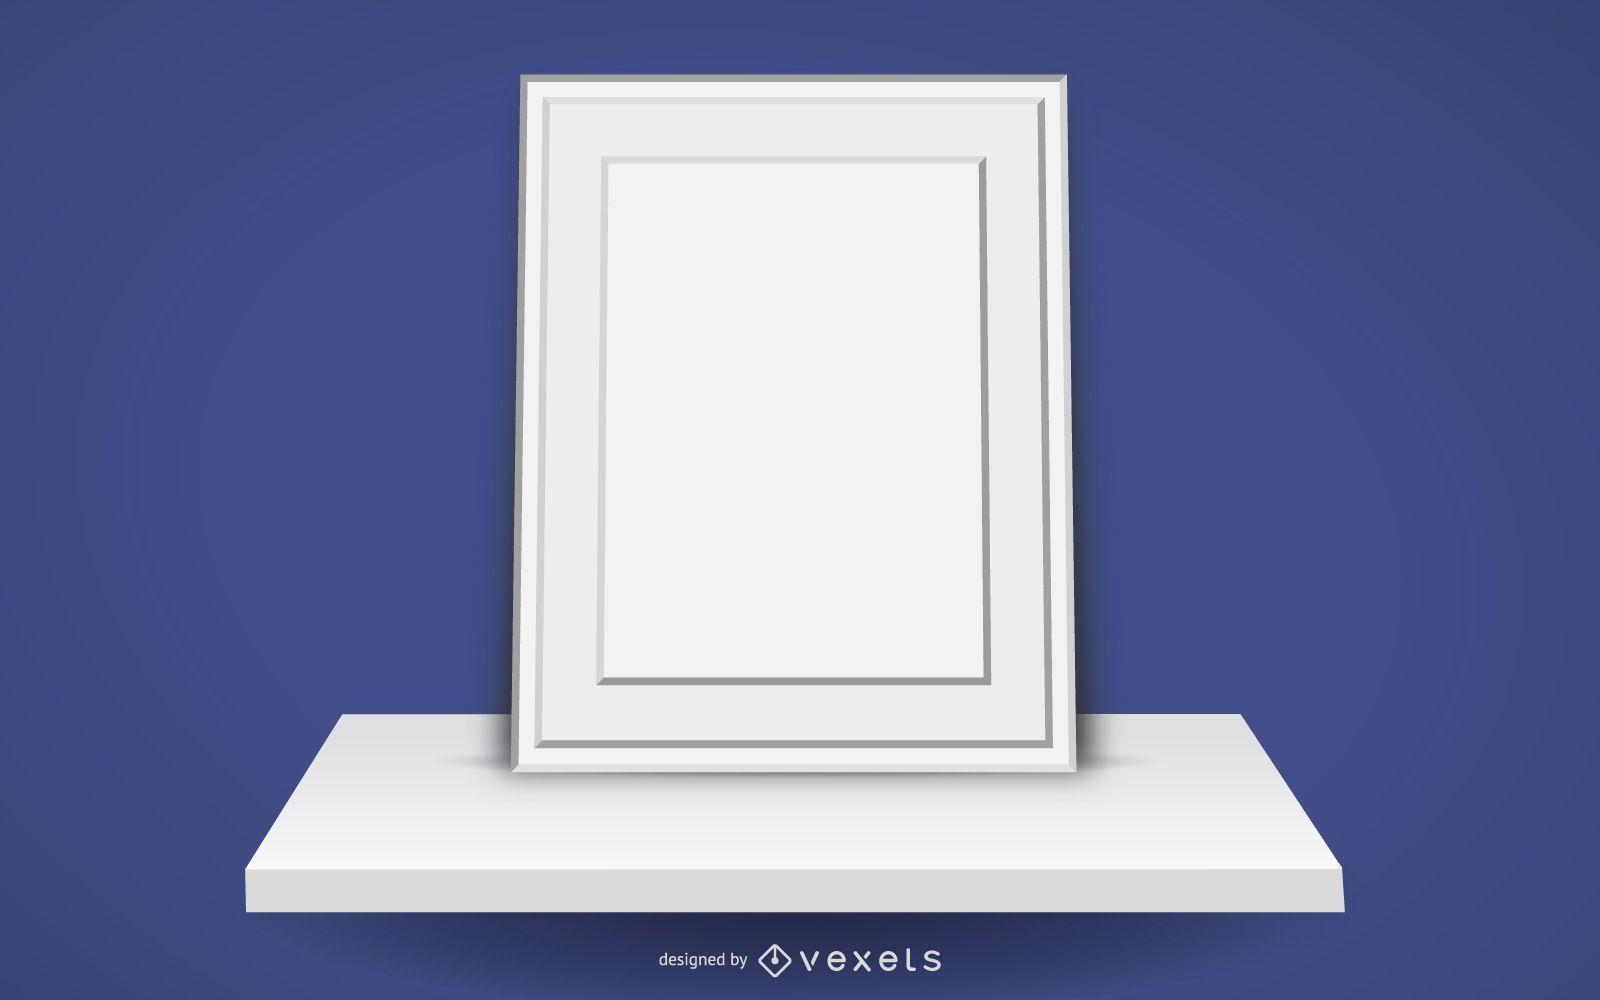 Photo Frame on 3D Shelf